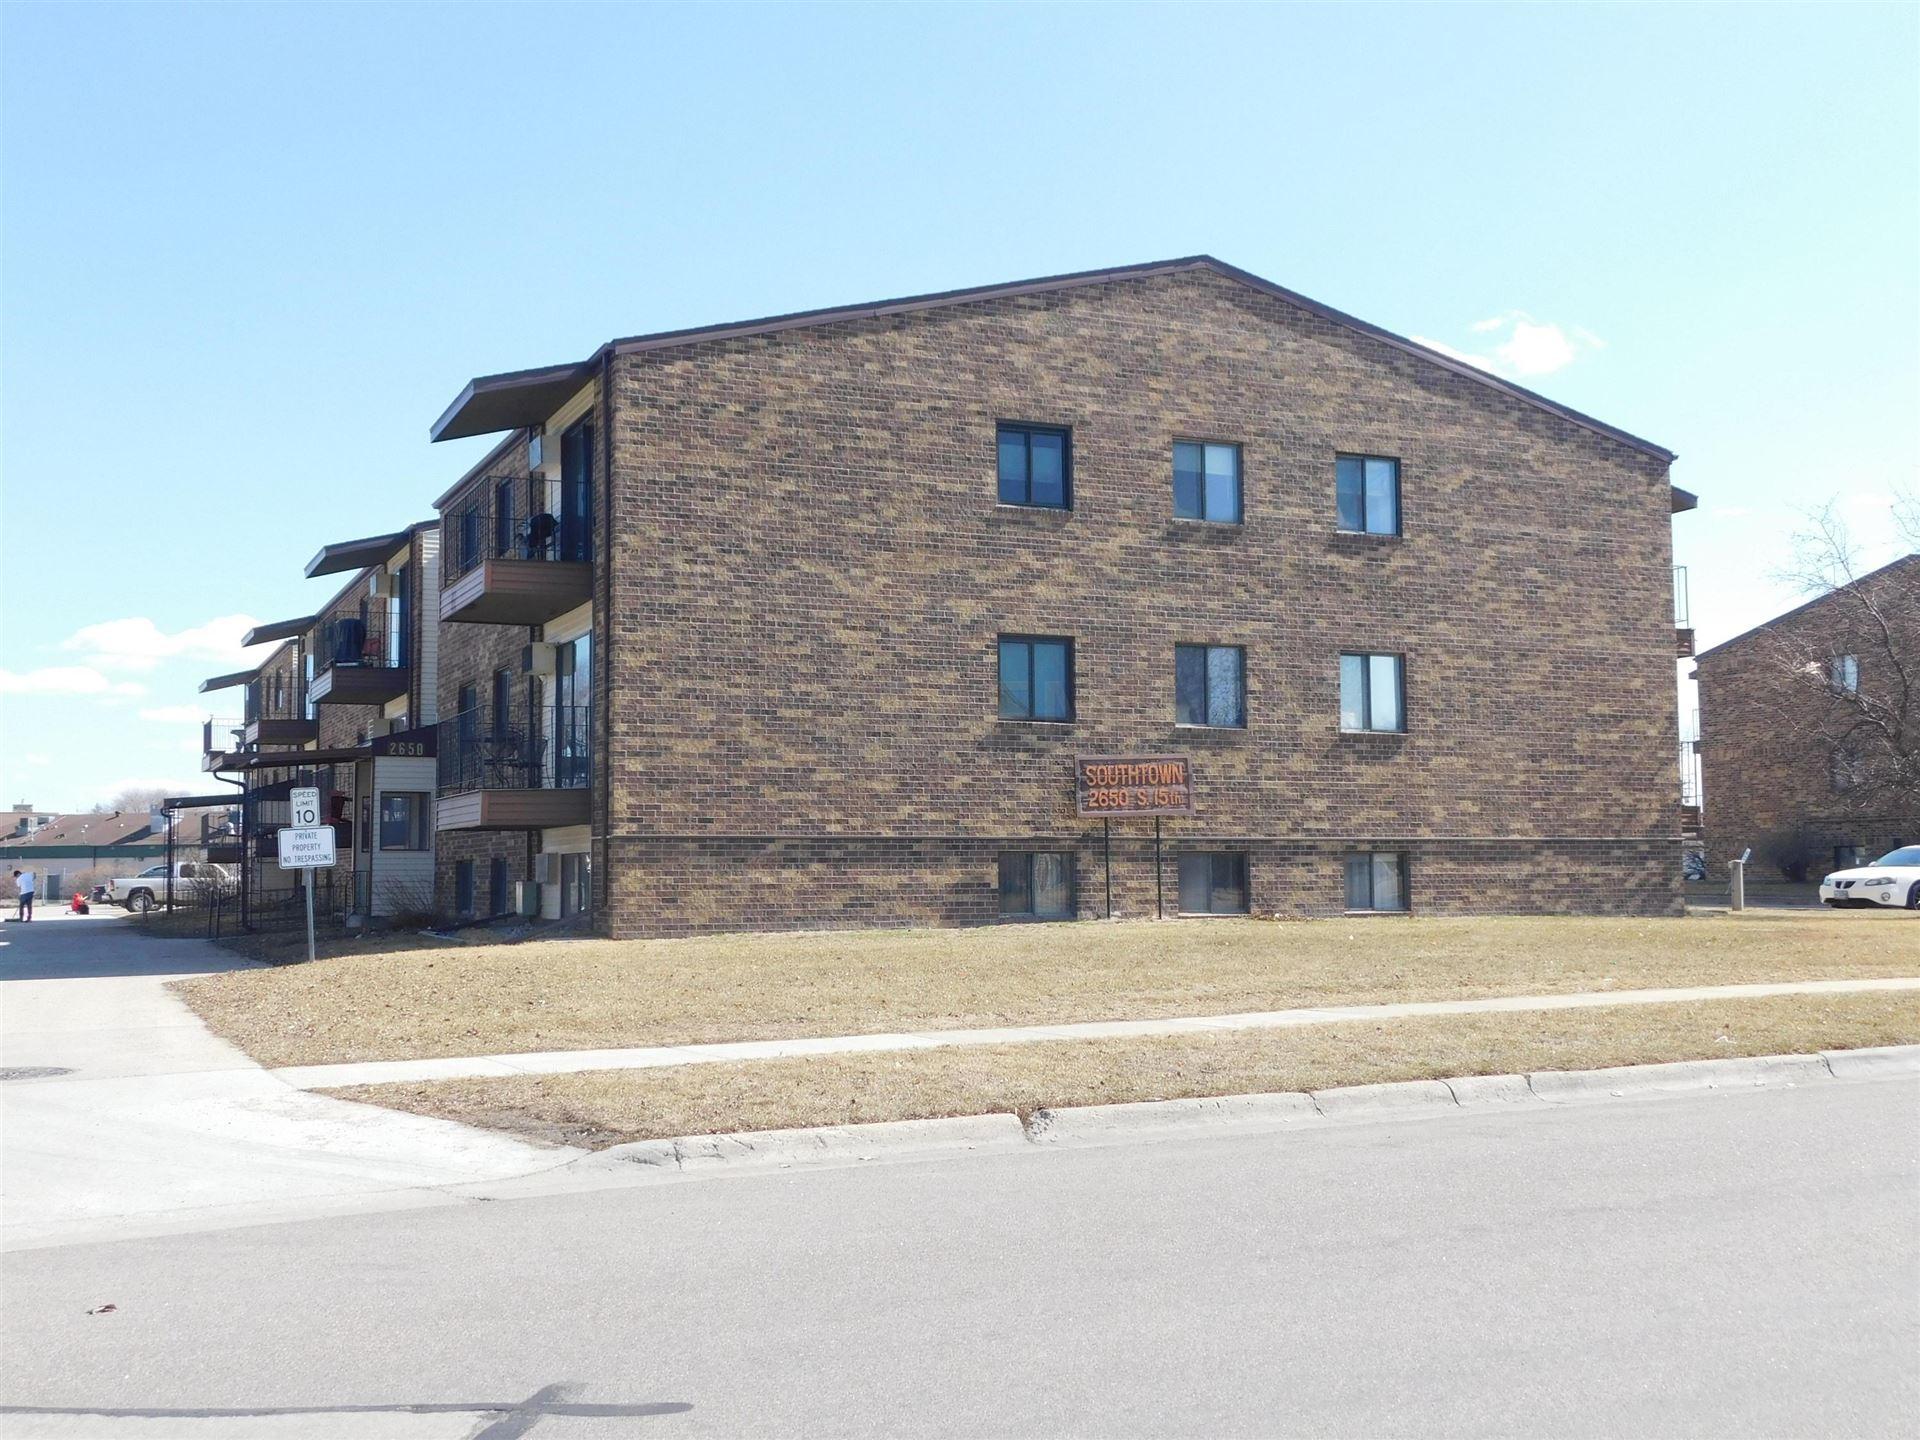 2650 15 Street S #307, Fargo, ND 58103 - #: 21-1441